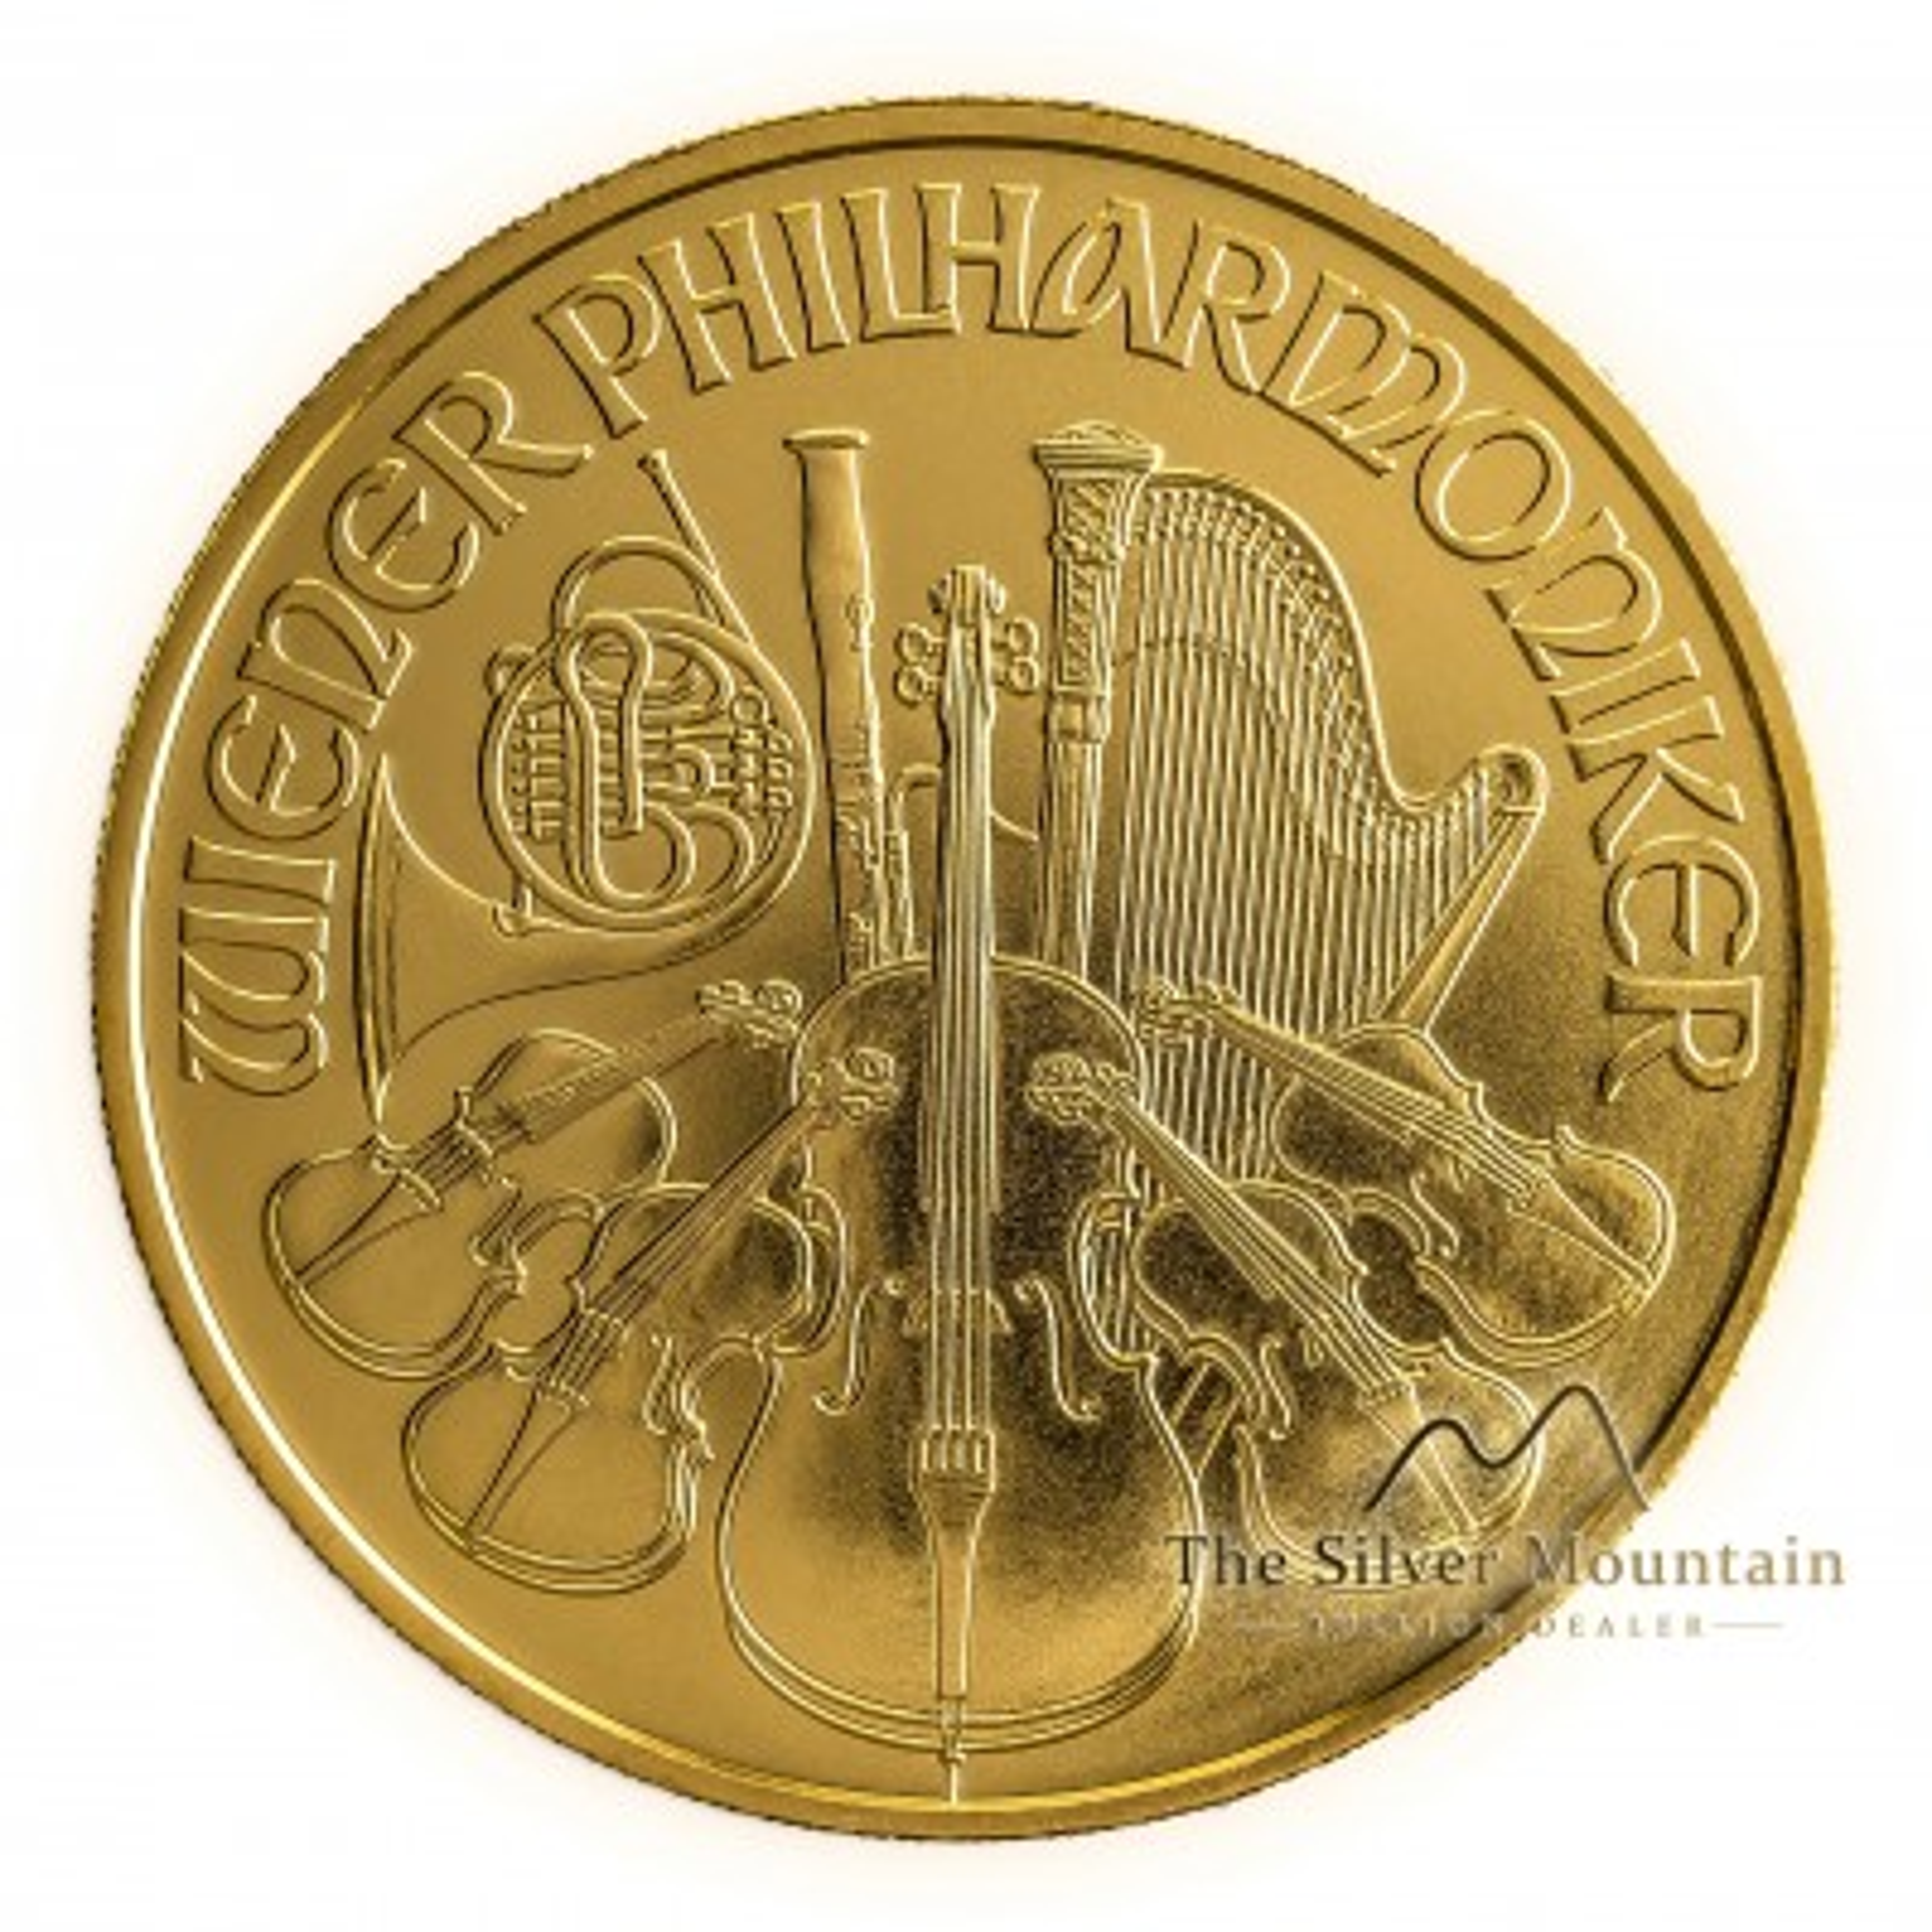 1/4 Troy ounce gold coin Philharmonic 2019